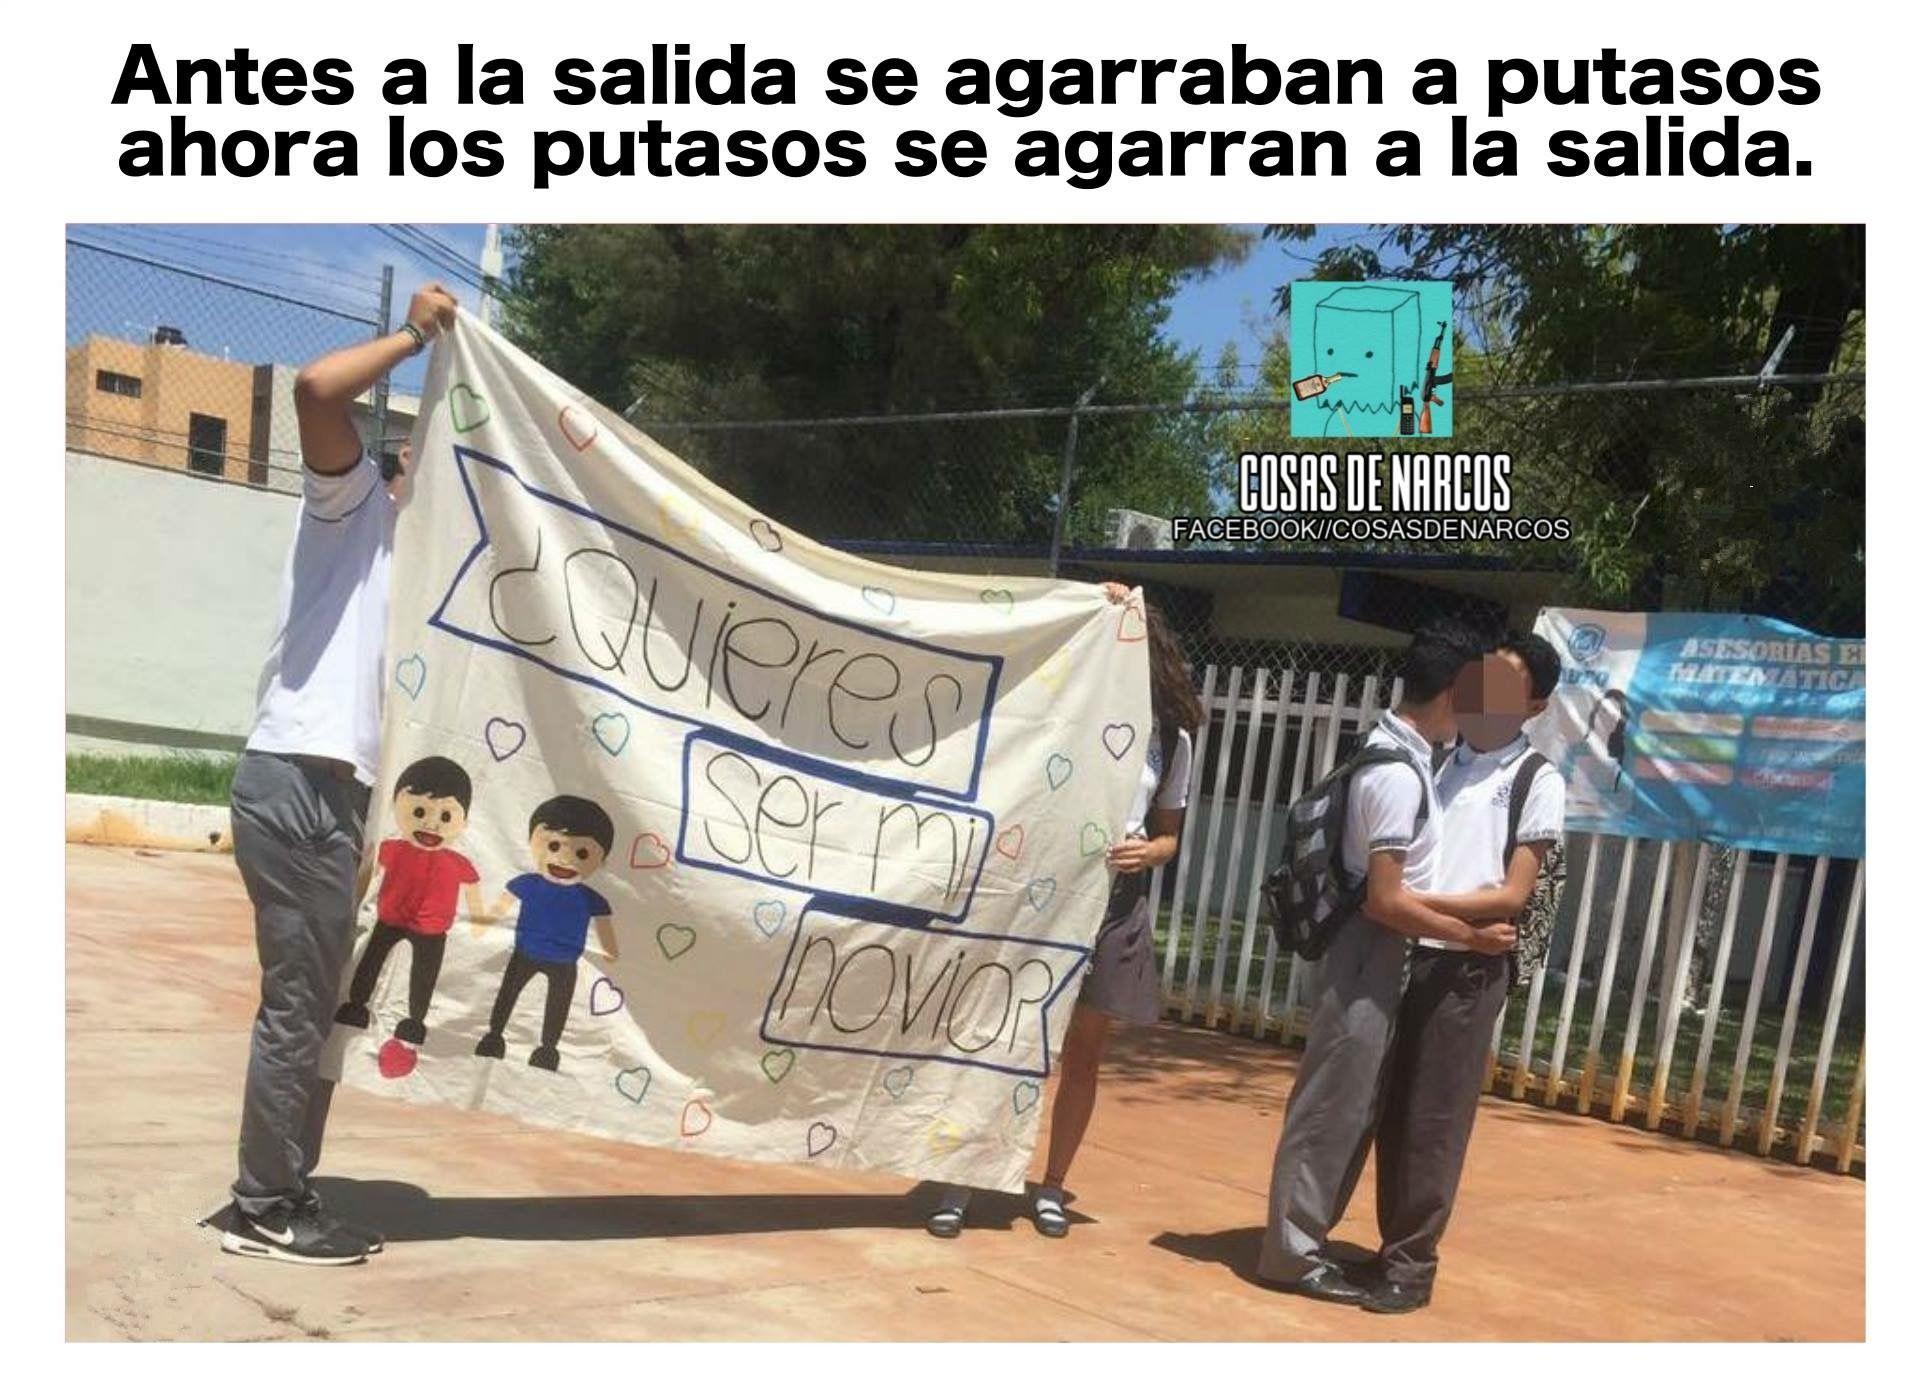 Pin By Mirucha Agradecida On Memes Funny Spanish Memes Funny Memes English Memes